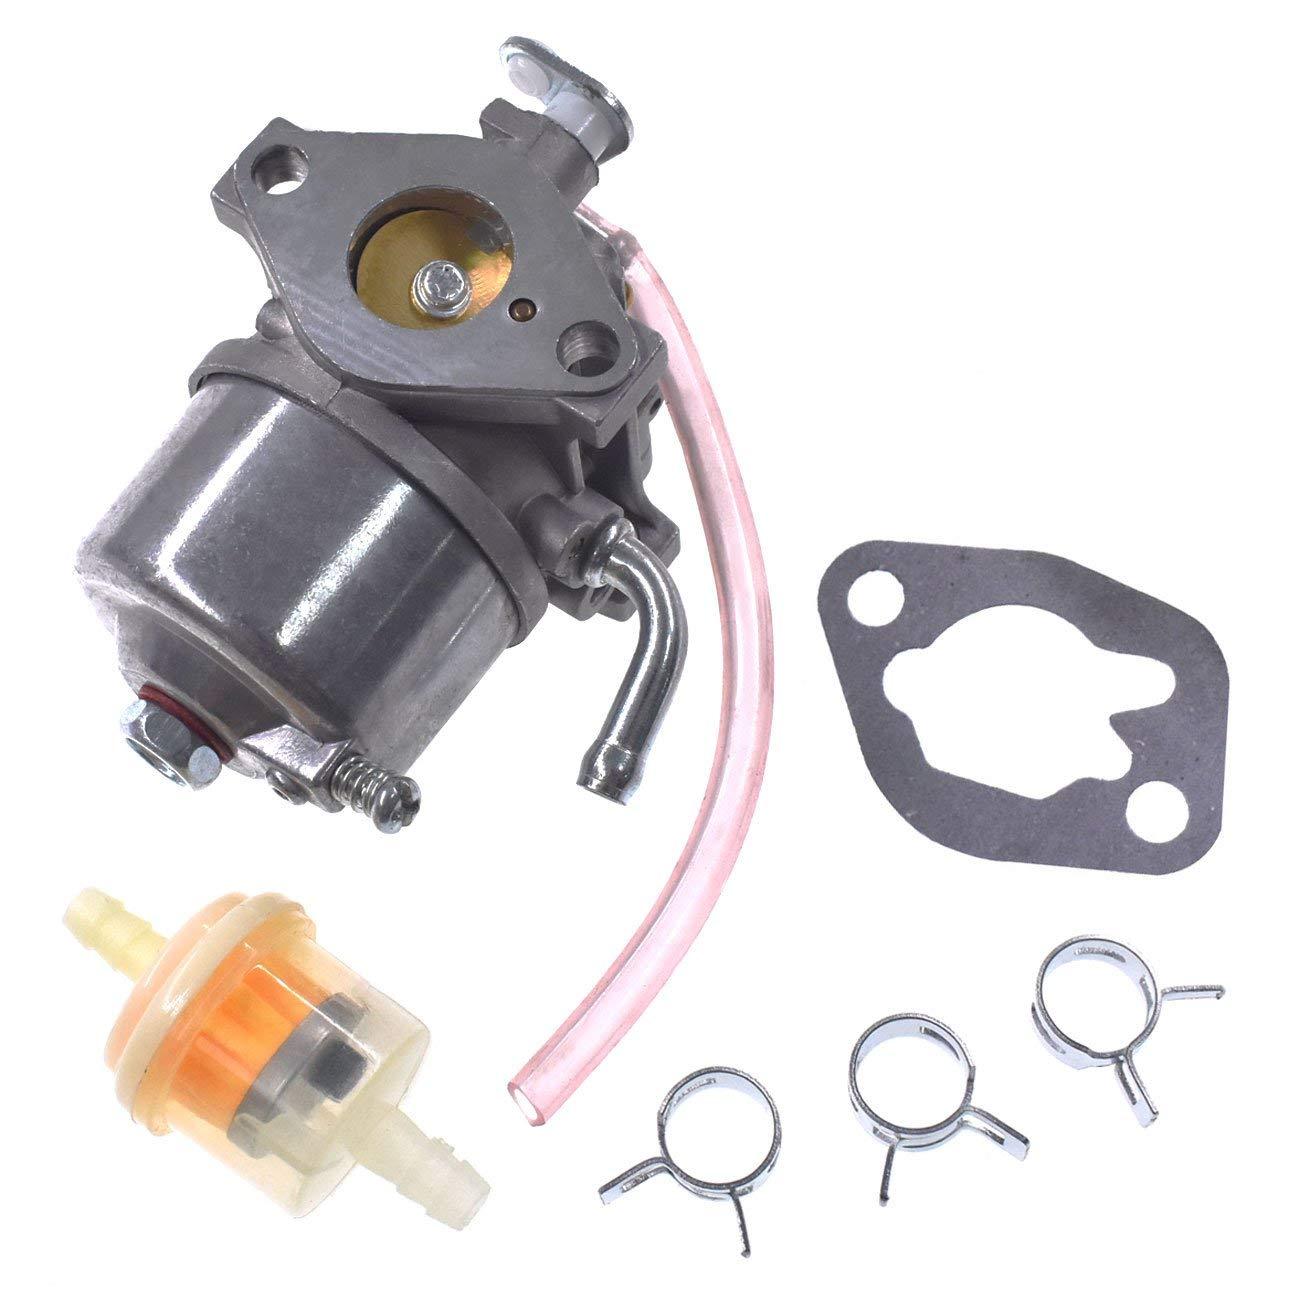 JRL Carburetor Carb 15003-2182 15003-2962 For Kawasaki FC150V 4 Stroke Engine